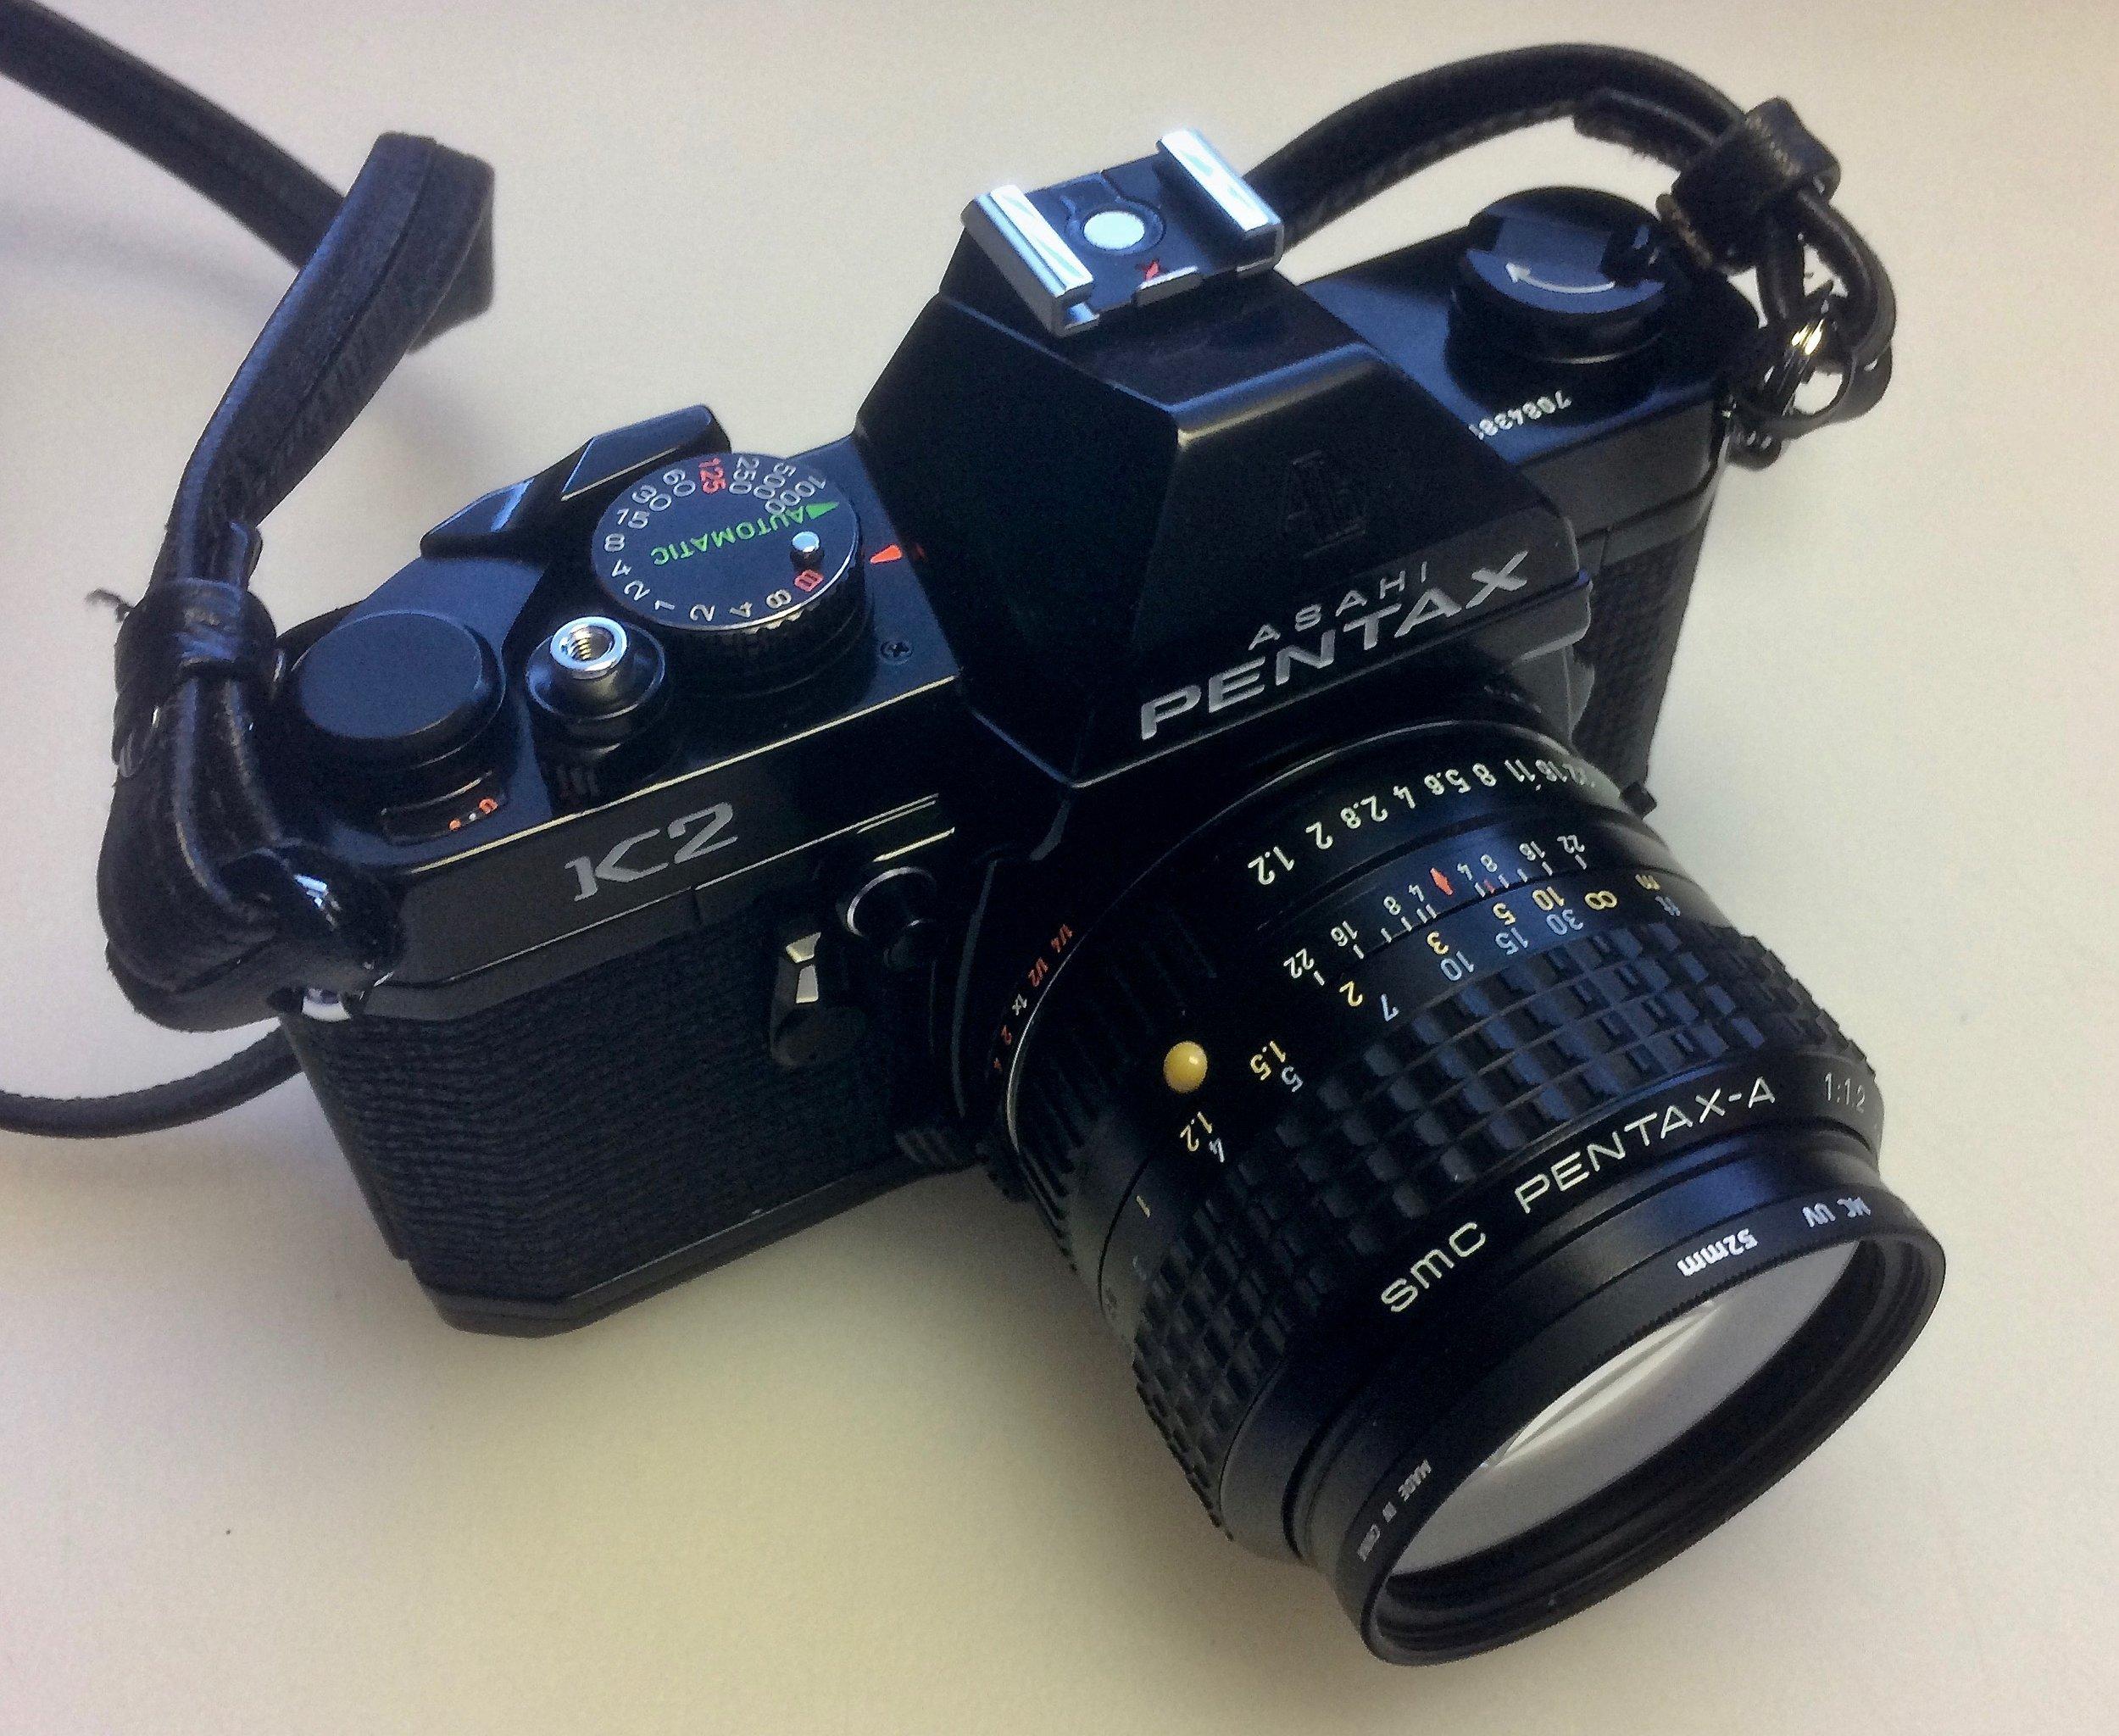 Pentax K2 with SMC Pentax-A 50mm f/1.2